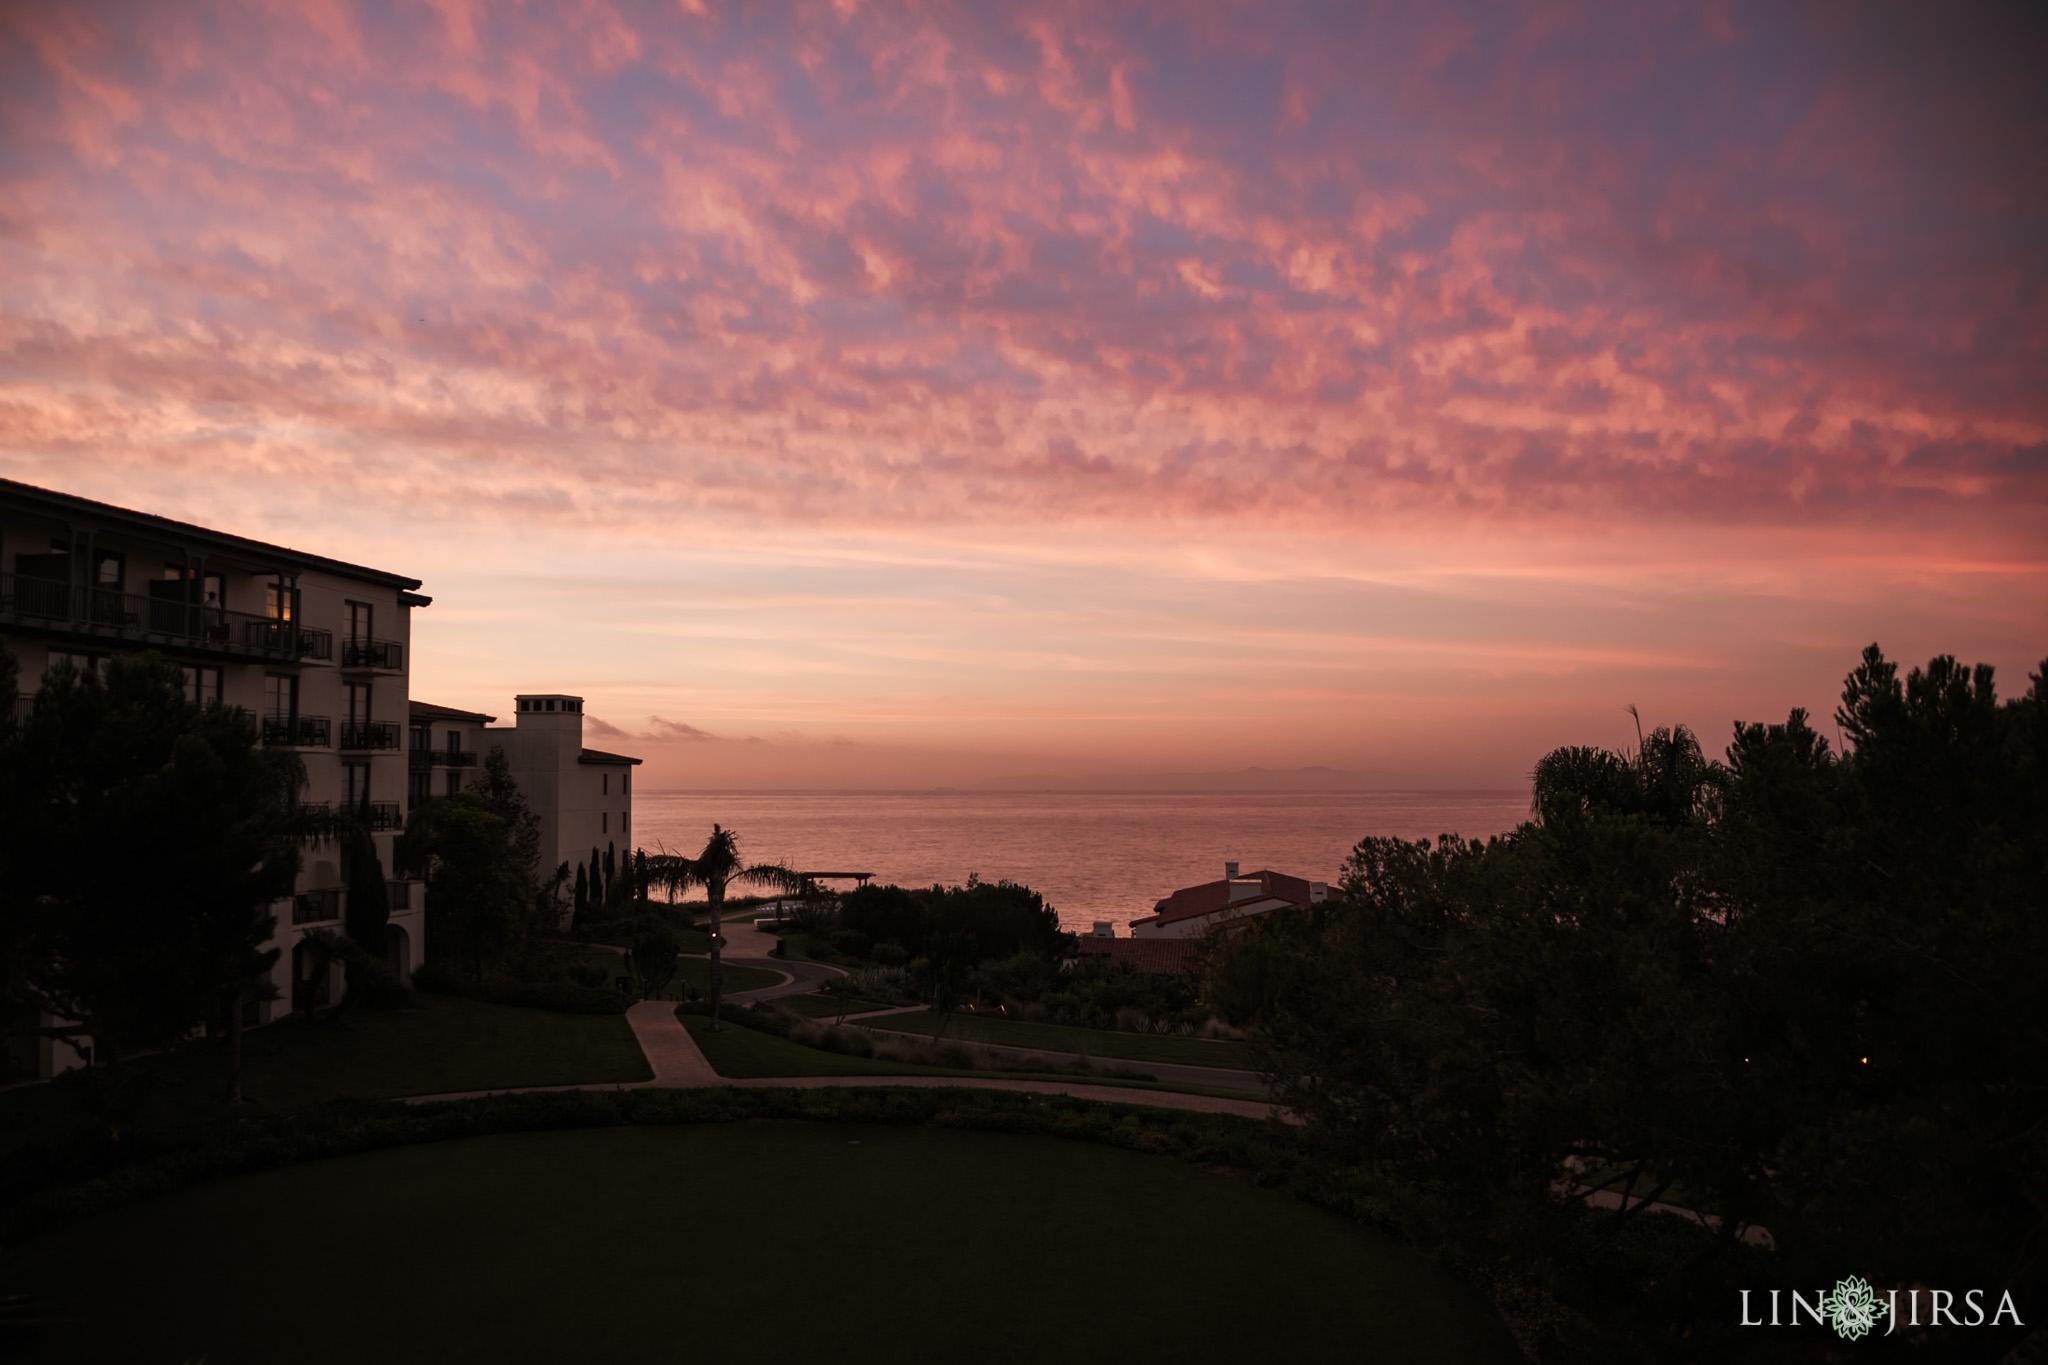 zbf sunrise terannea resort palos verdes wedding photography